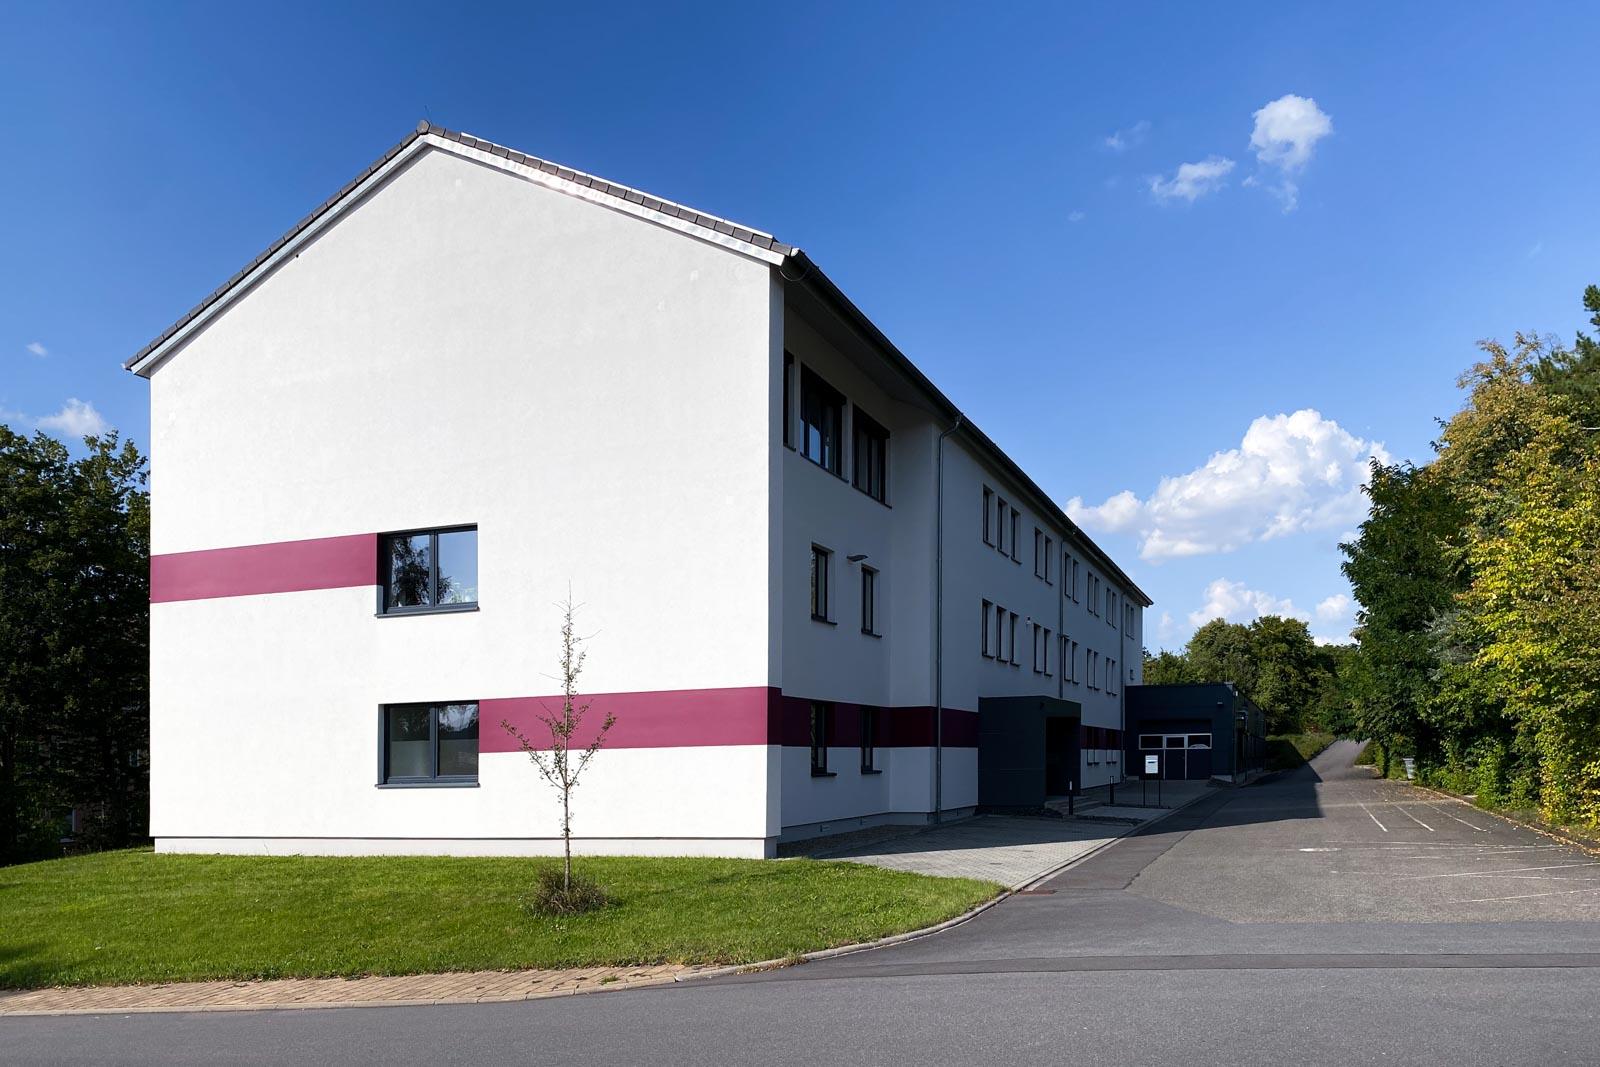 Bürogebäude mit Produktionshalle Fa. Di-modell